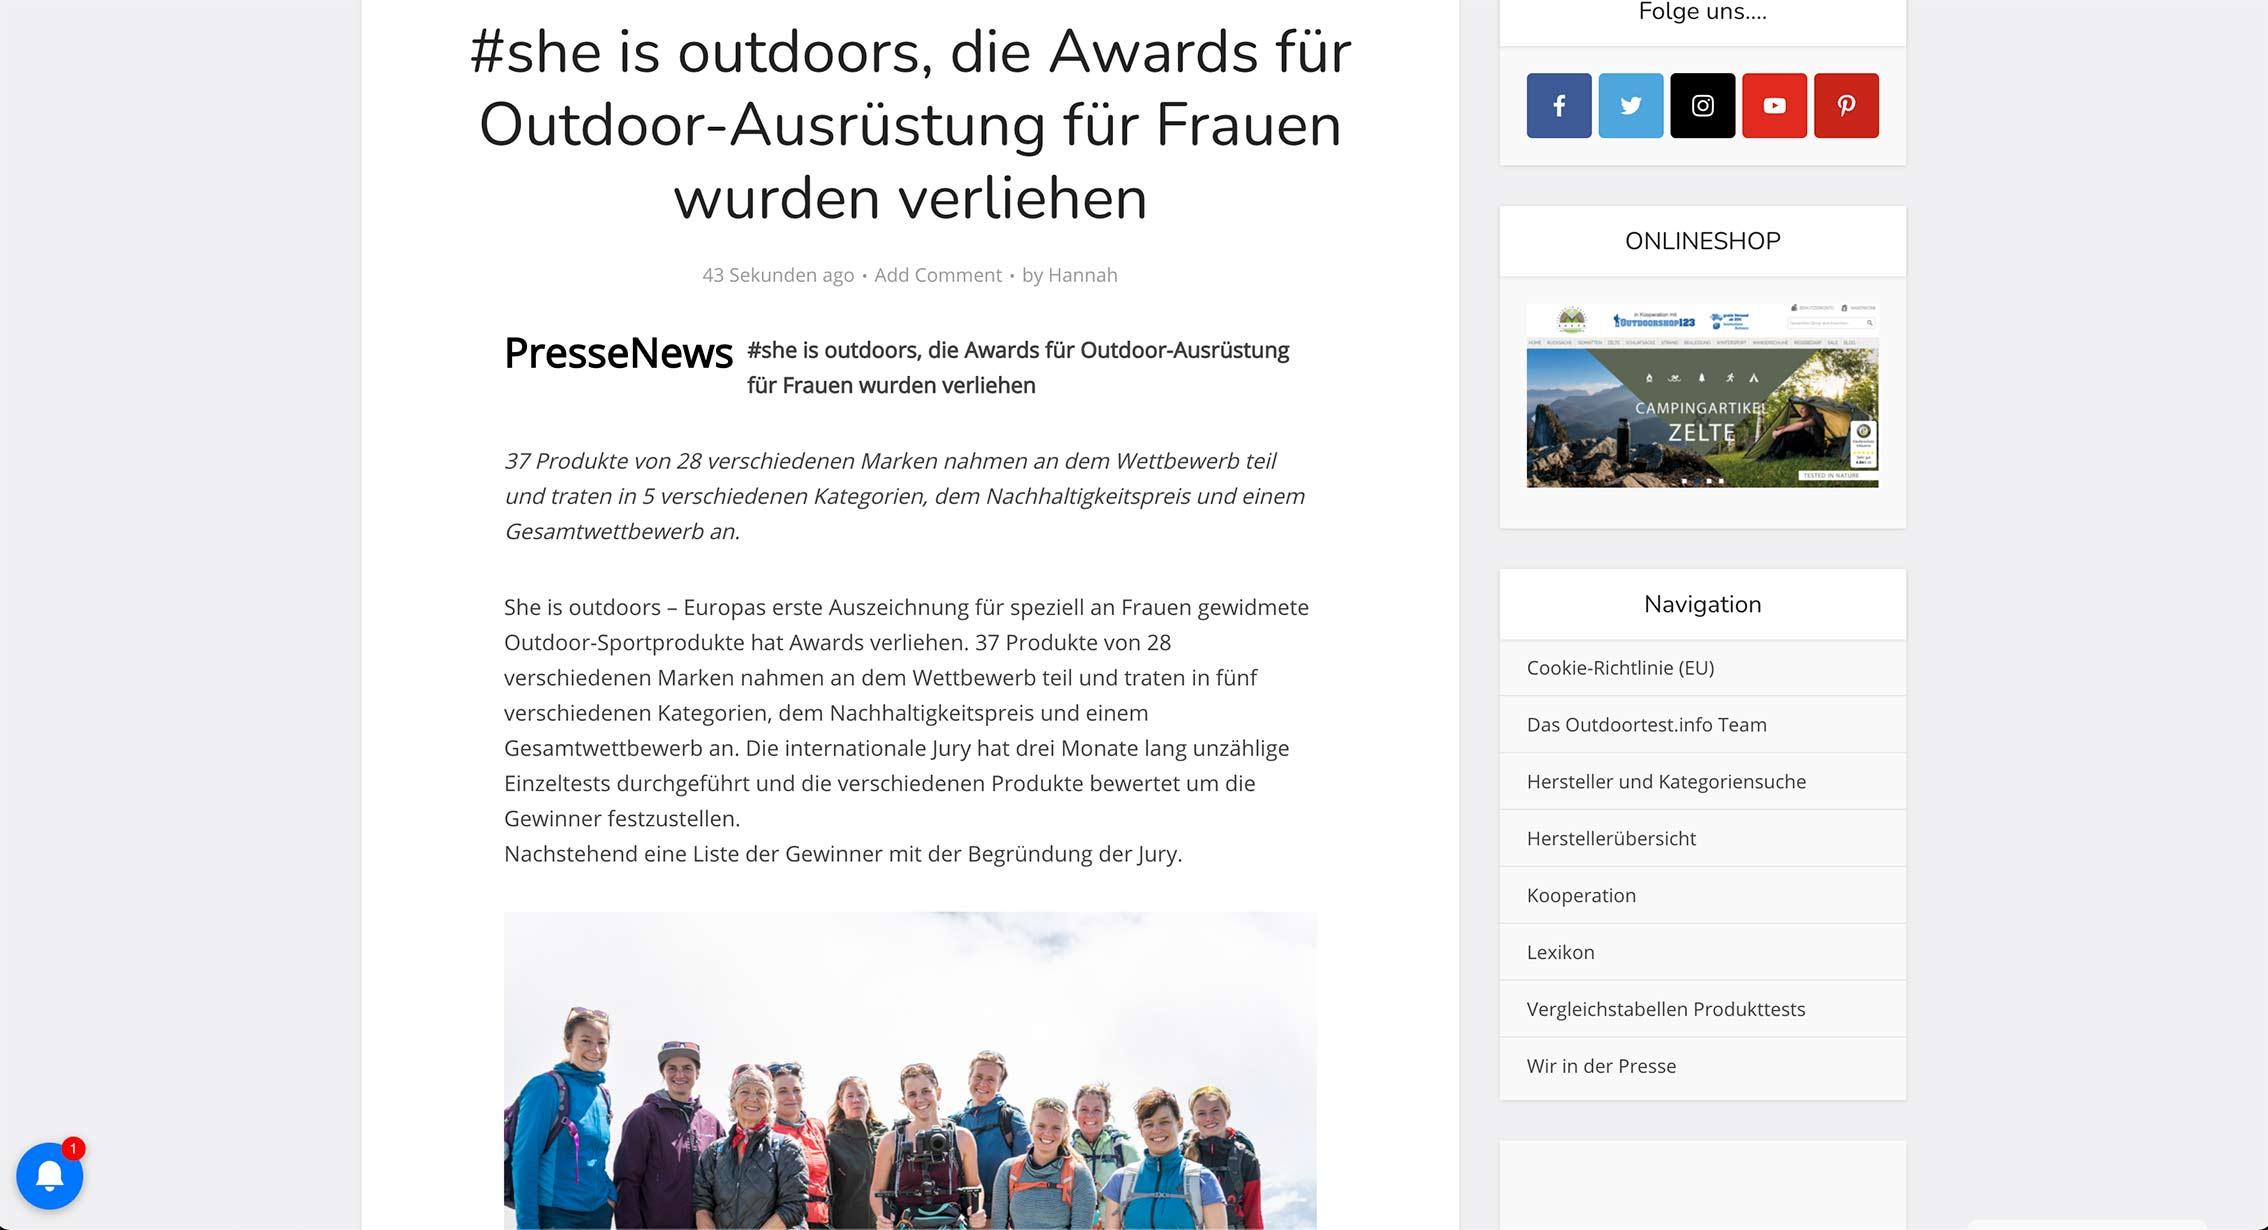 Tearsheet Outdoortest.info